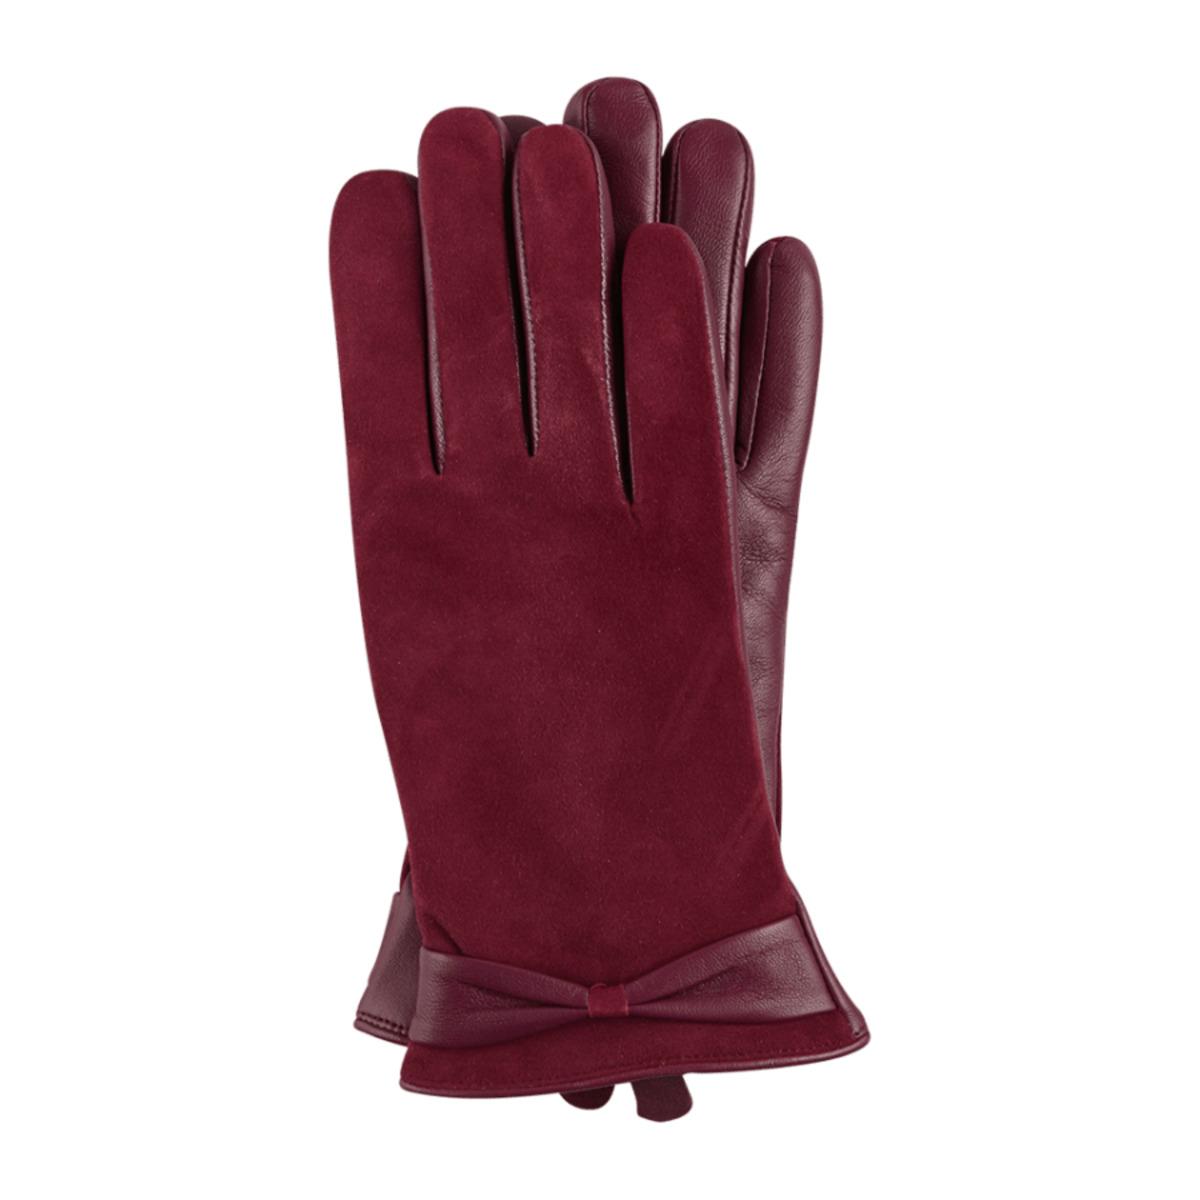 Bild 5 von ROYAL LIFE     Leder-Handschuhe